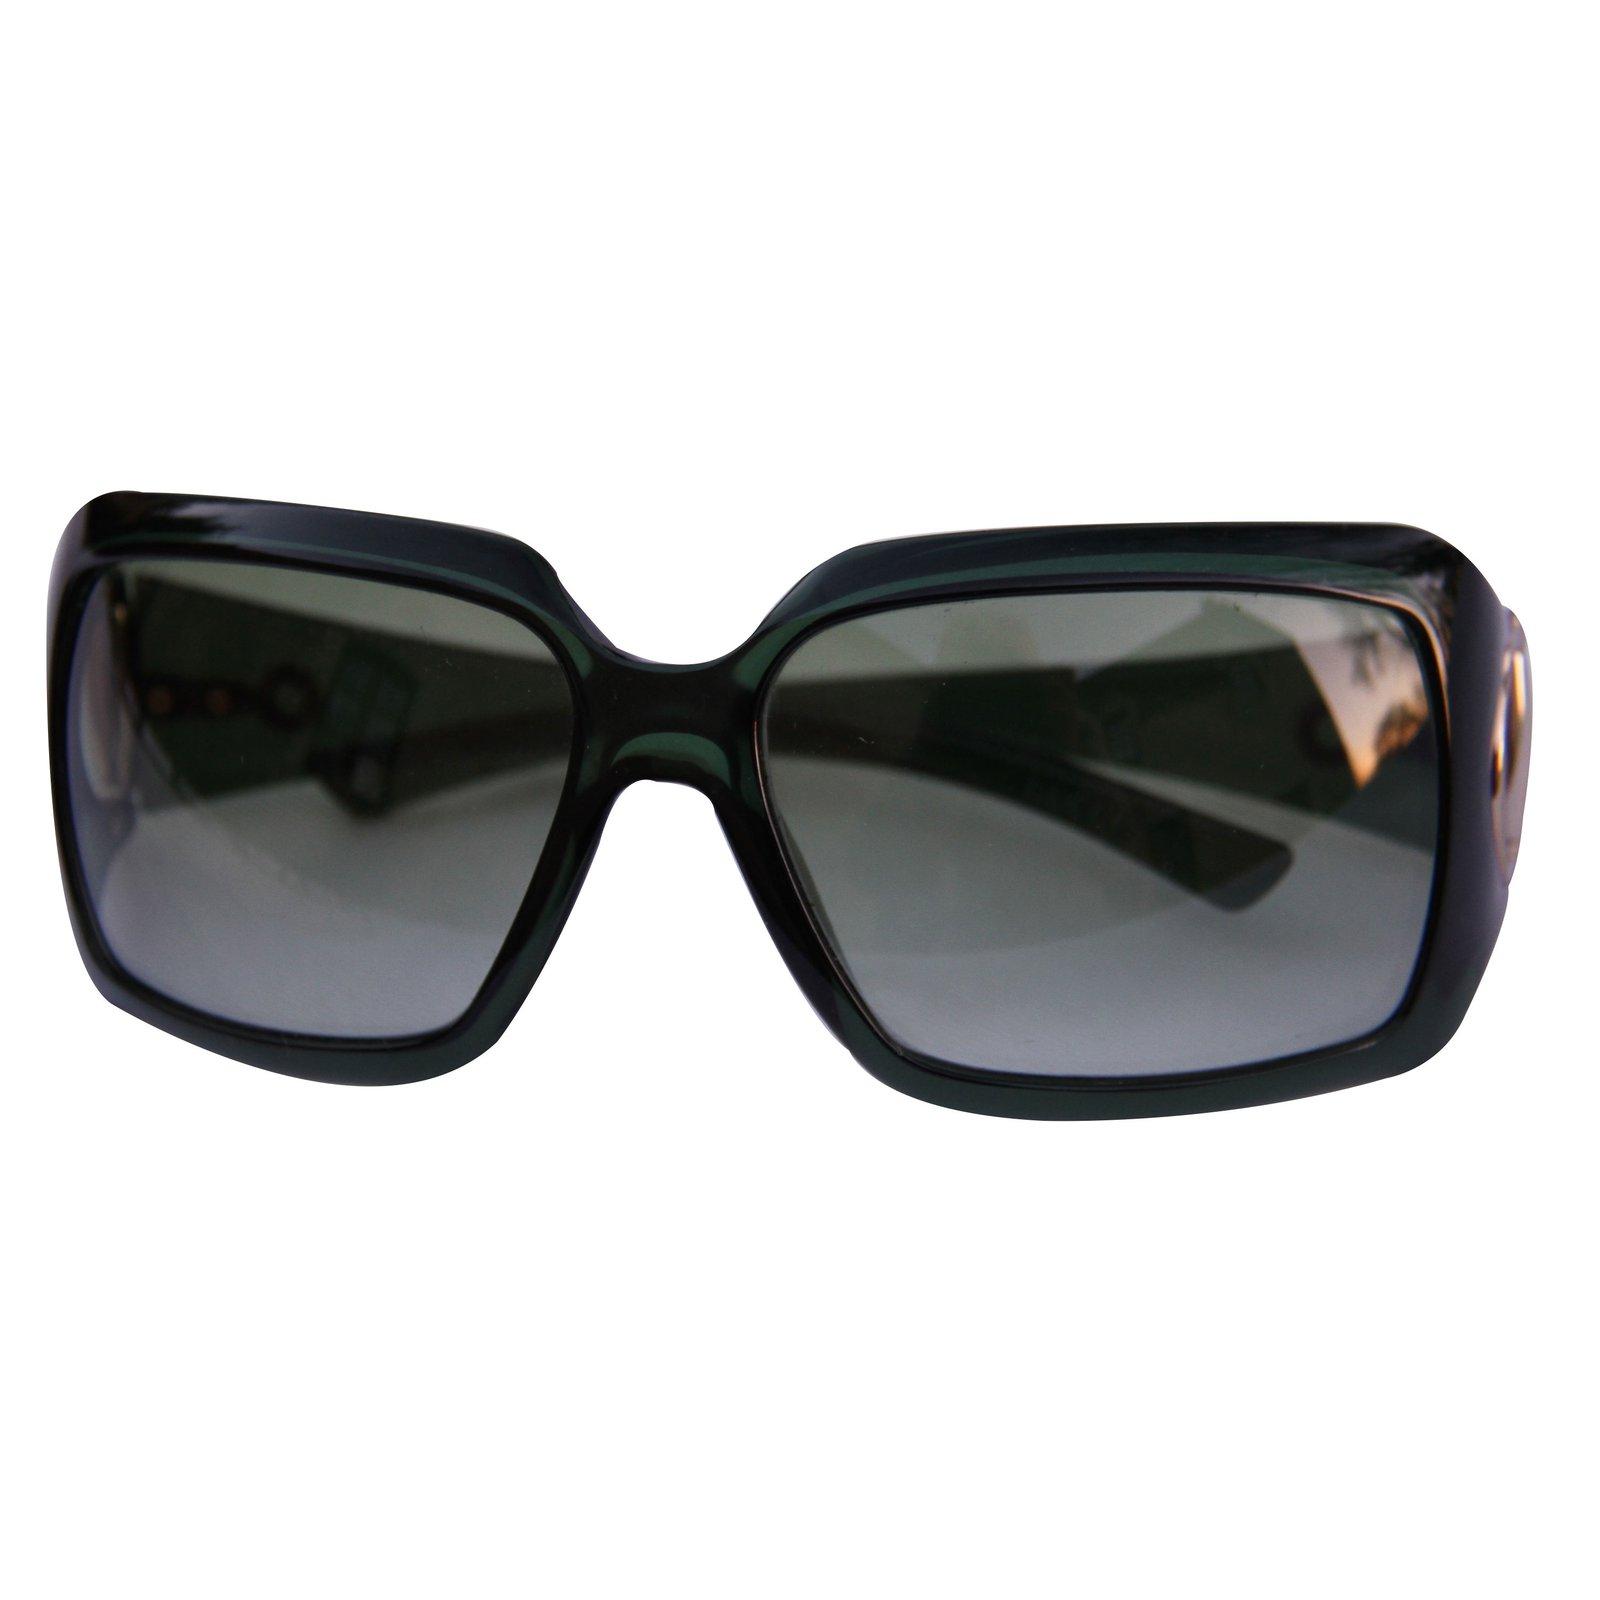 37c5190979 Gucci Sunglasses Sunglasses Plastic Black ref.11467 - Joli Closet